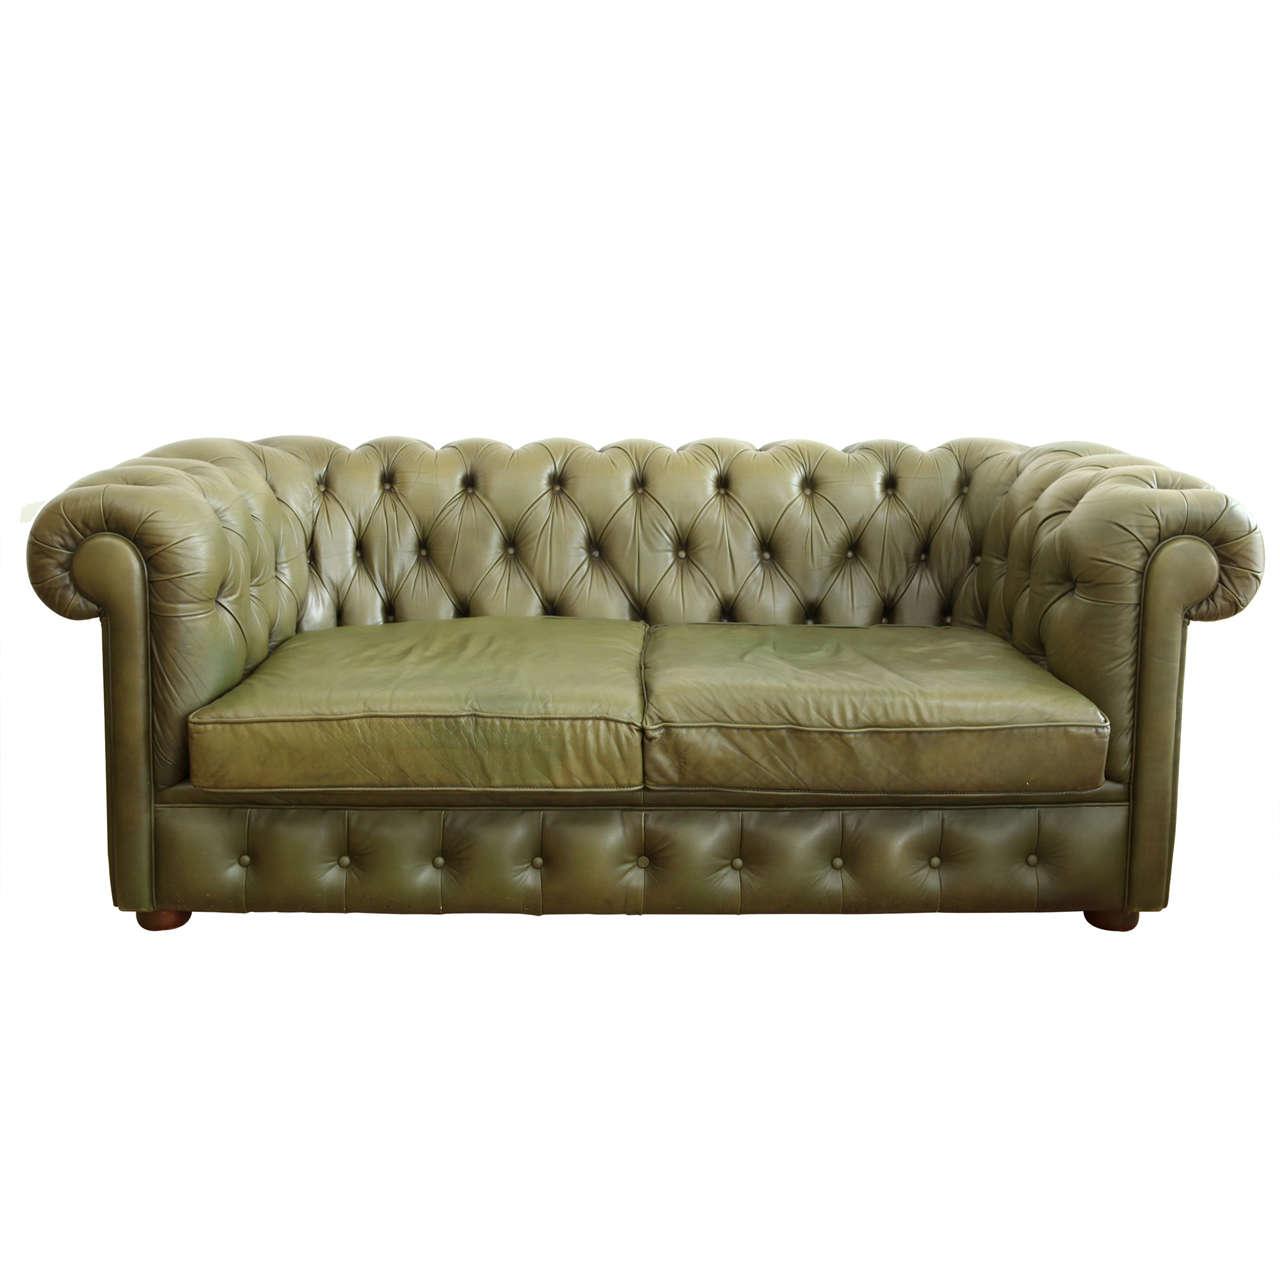 Furniture Johor Bahru Leather Sofa: Leather Chesterfield Sofa At 1stdibs